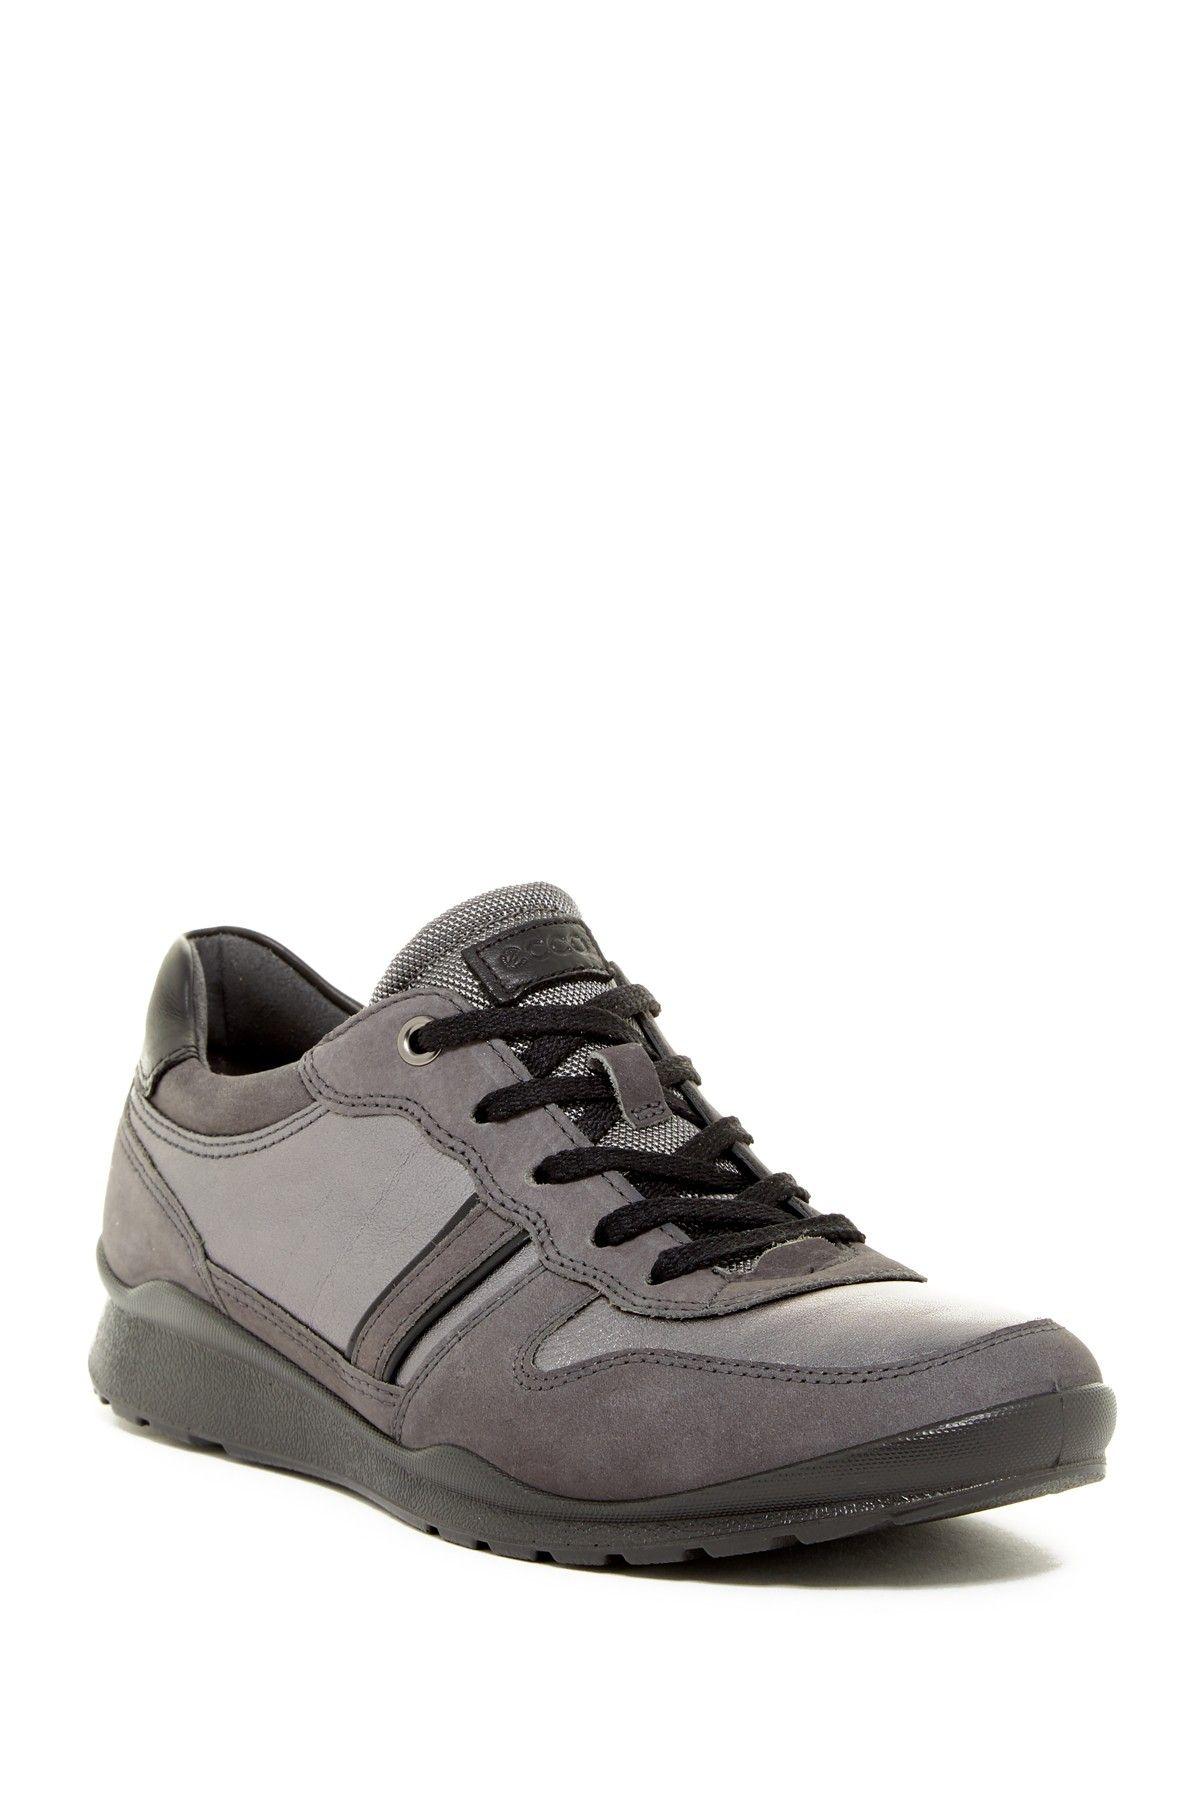 Mobil III Sneaker by ECCO on @HauteLook